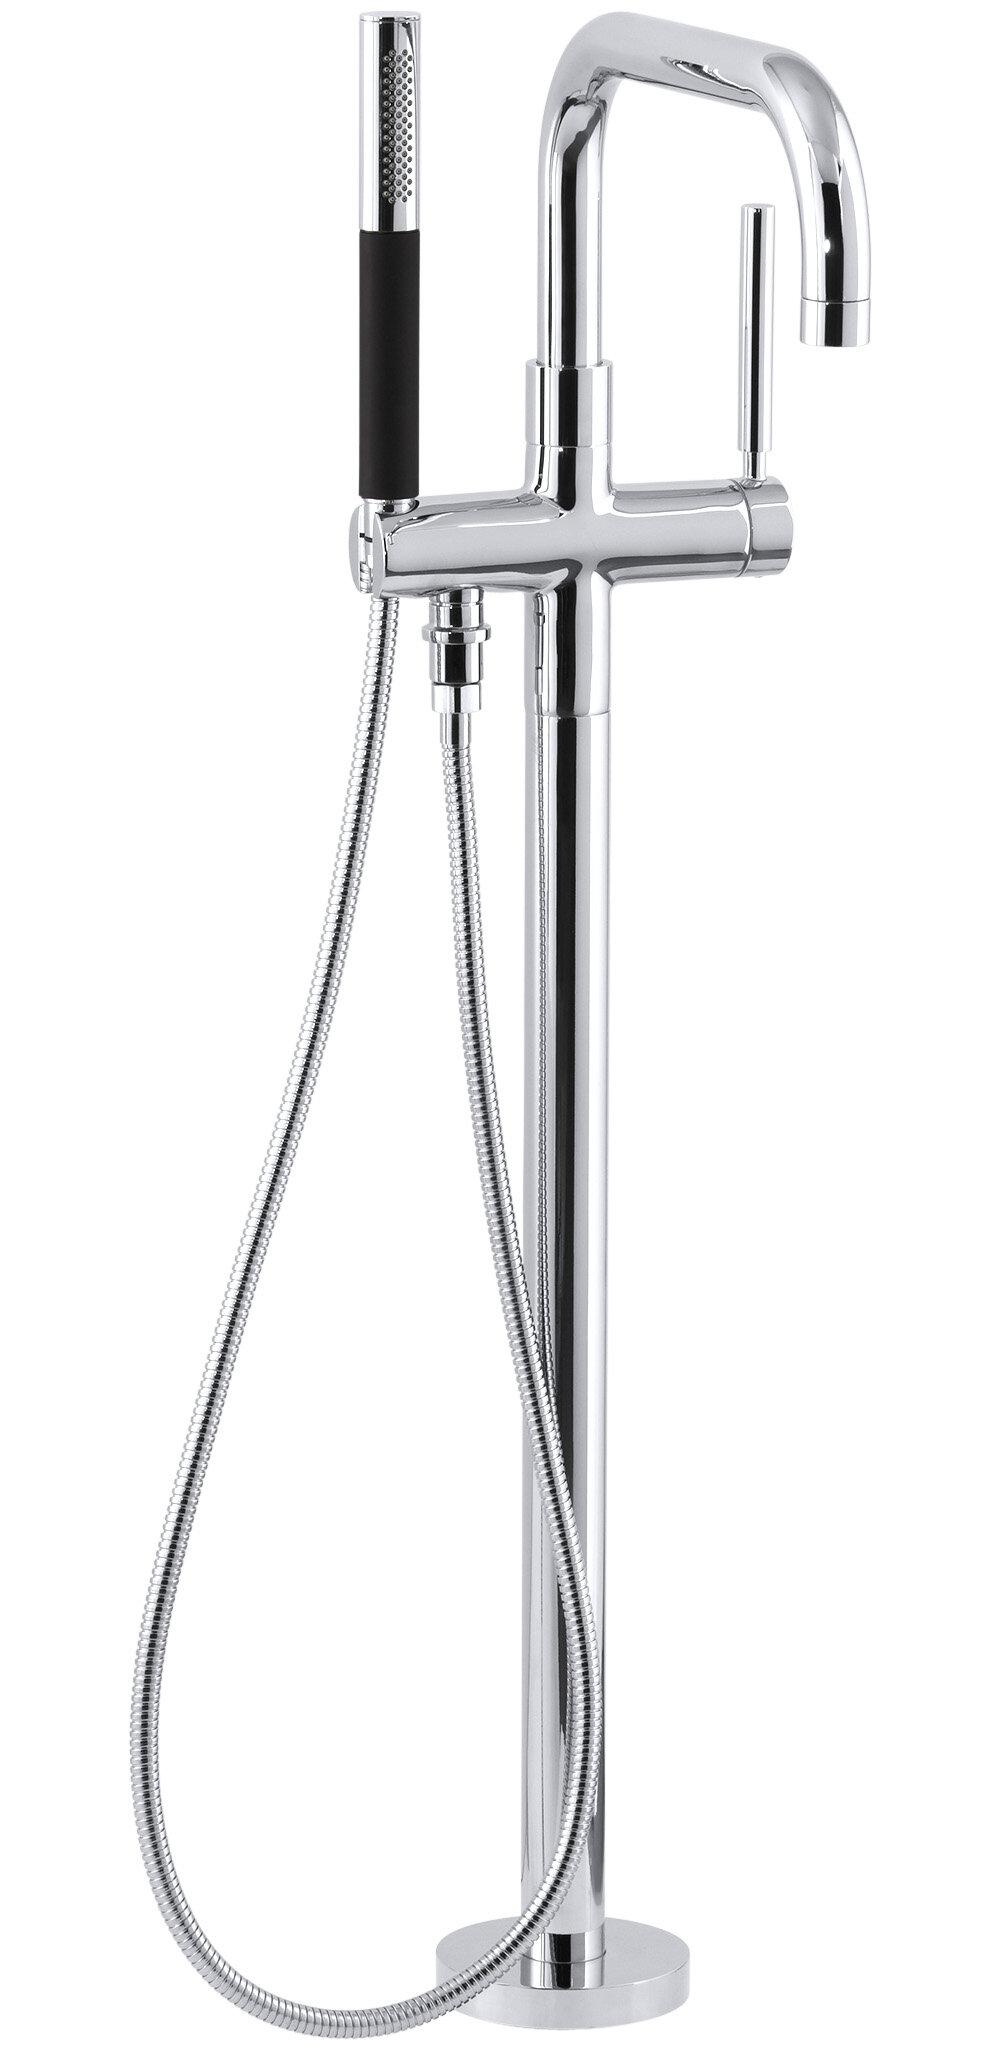 K T97328 4 BN,CP,SN Kohler Purist Single Handle Floor Mount Tub Filler With Hand  Shower U0026 Reviews   Wayfair